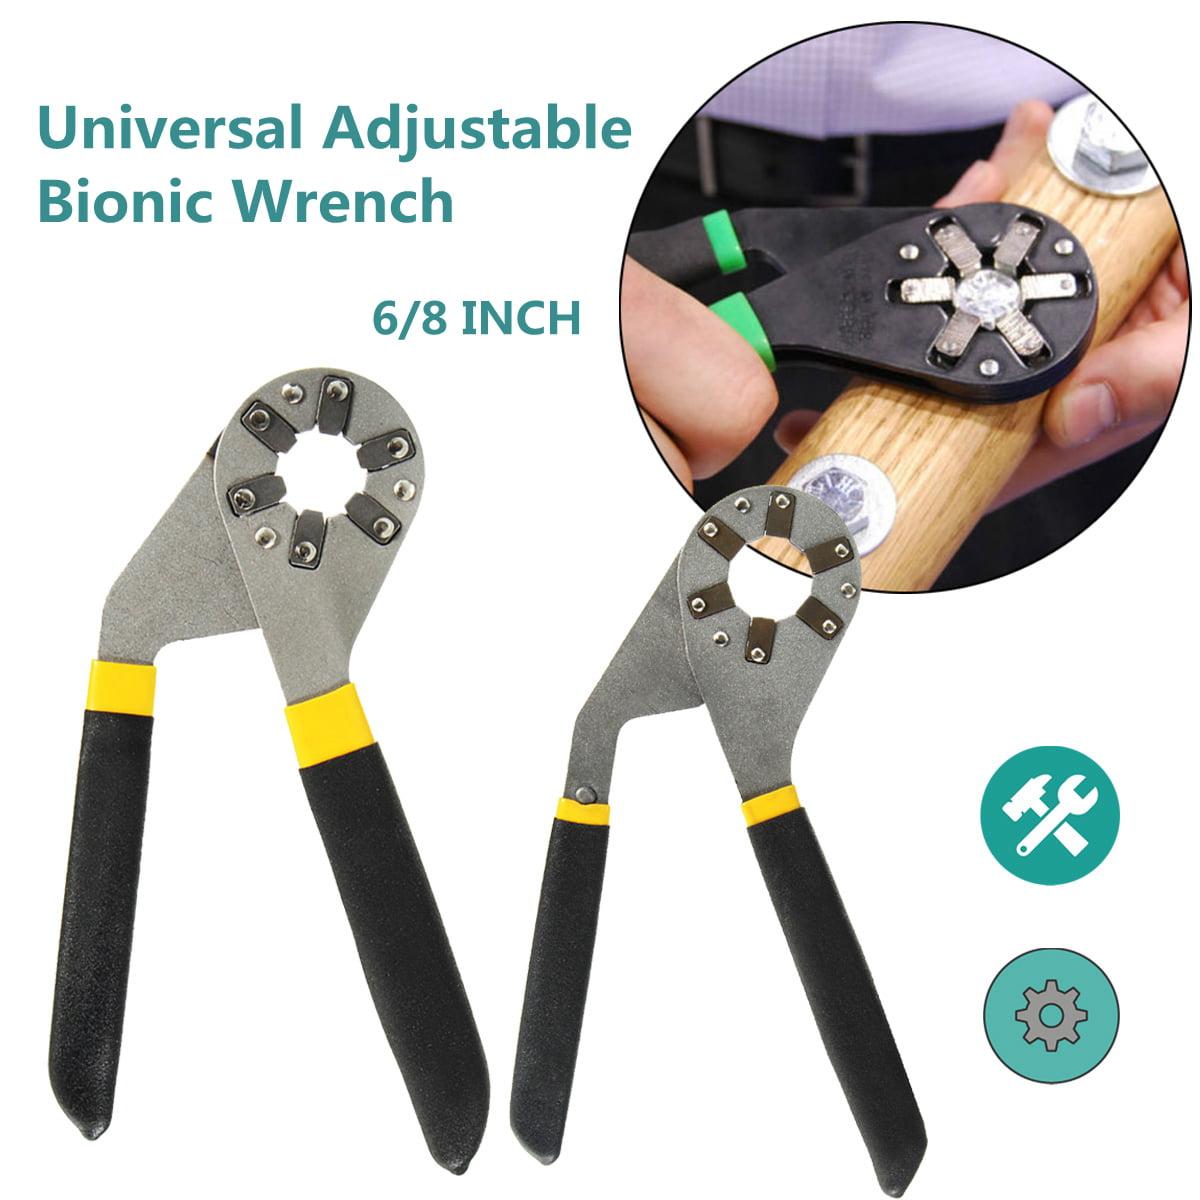 Grtsunsea 6/8 inch Adjustable Hexagon Universal Quick Magic Wrench Adjustable Plier